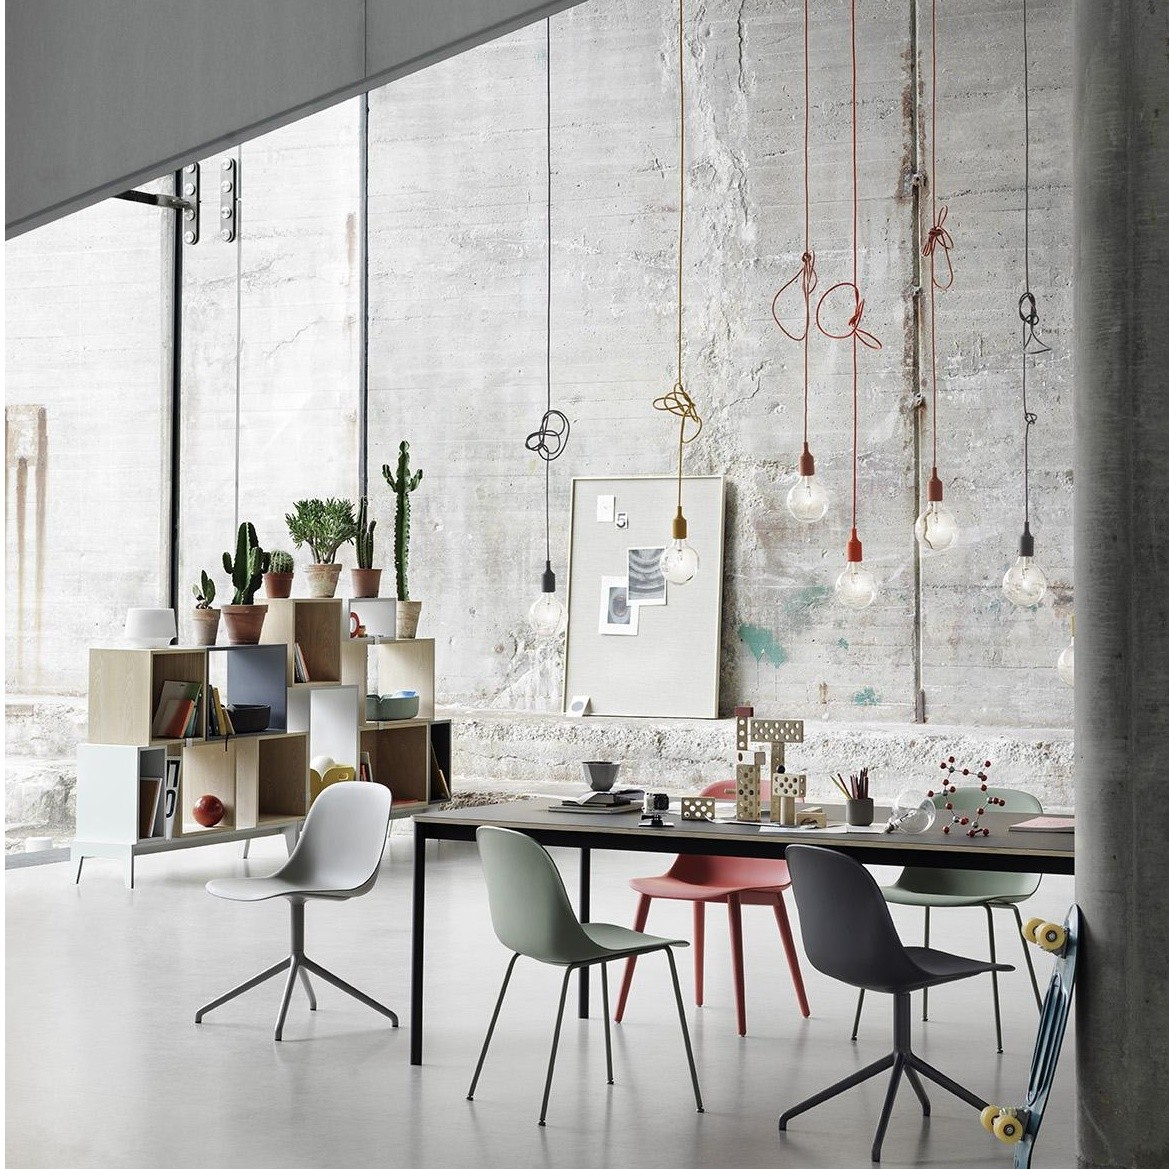 e27 pendelleuchte muuto leuchten. Black Bedroom Furniture Sets. Home Design Ideas